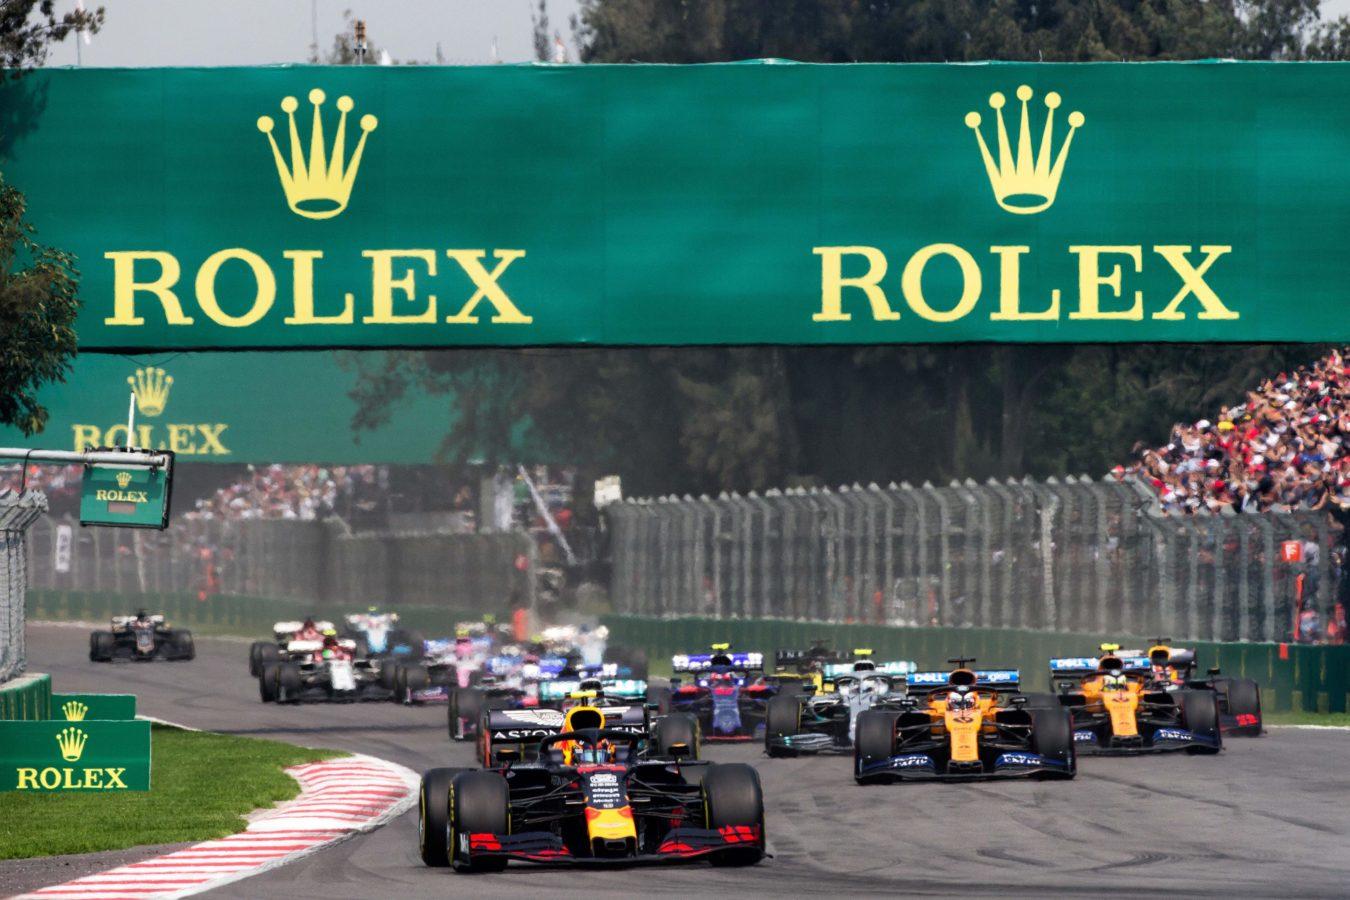 Rolex and Motorsport: The Winning Team